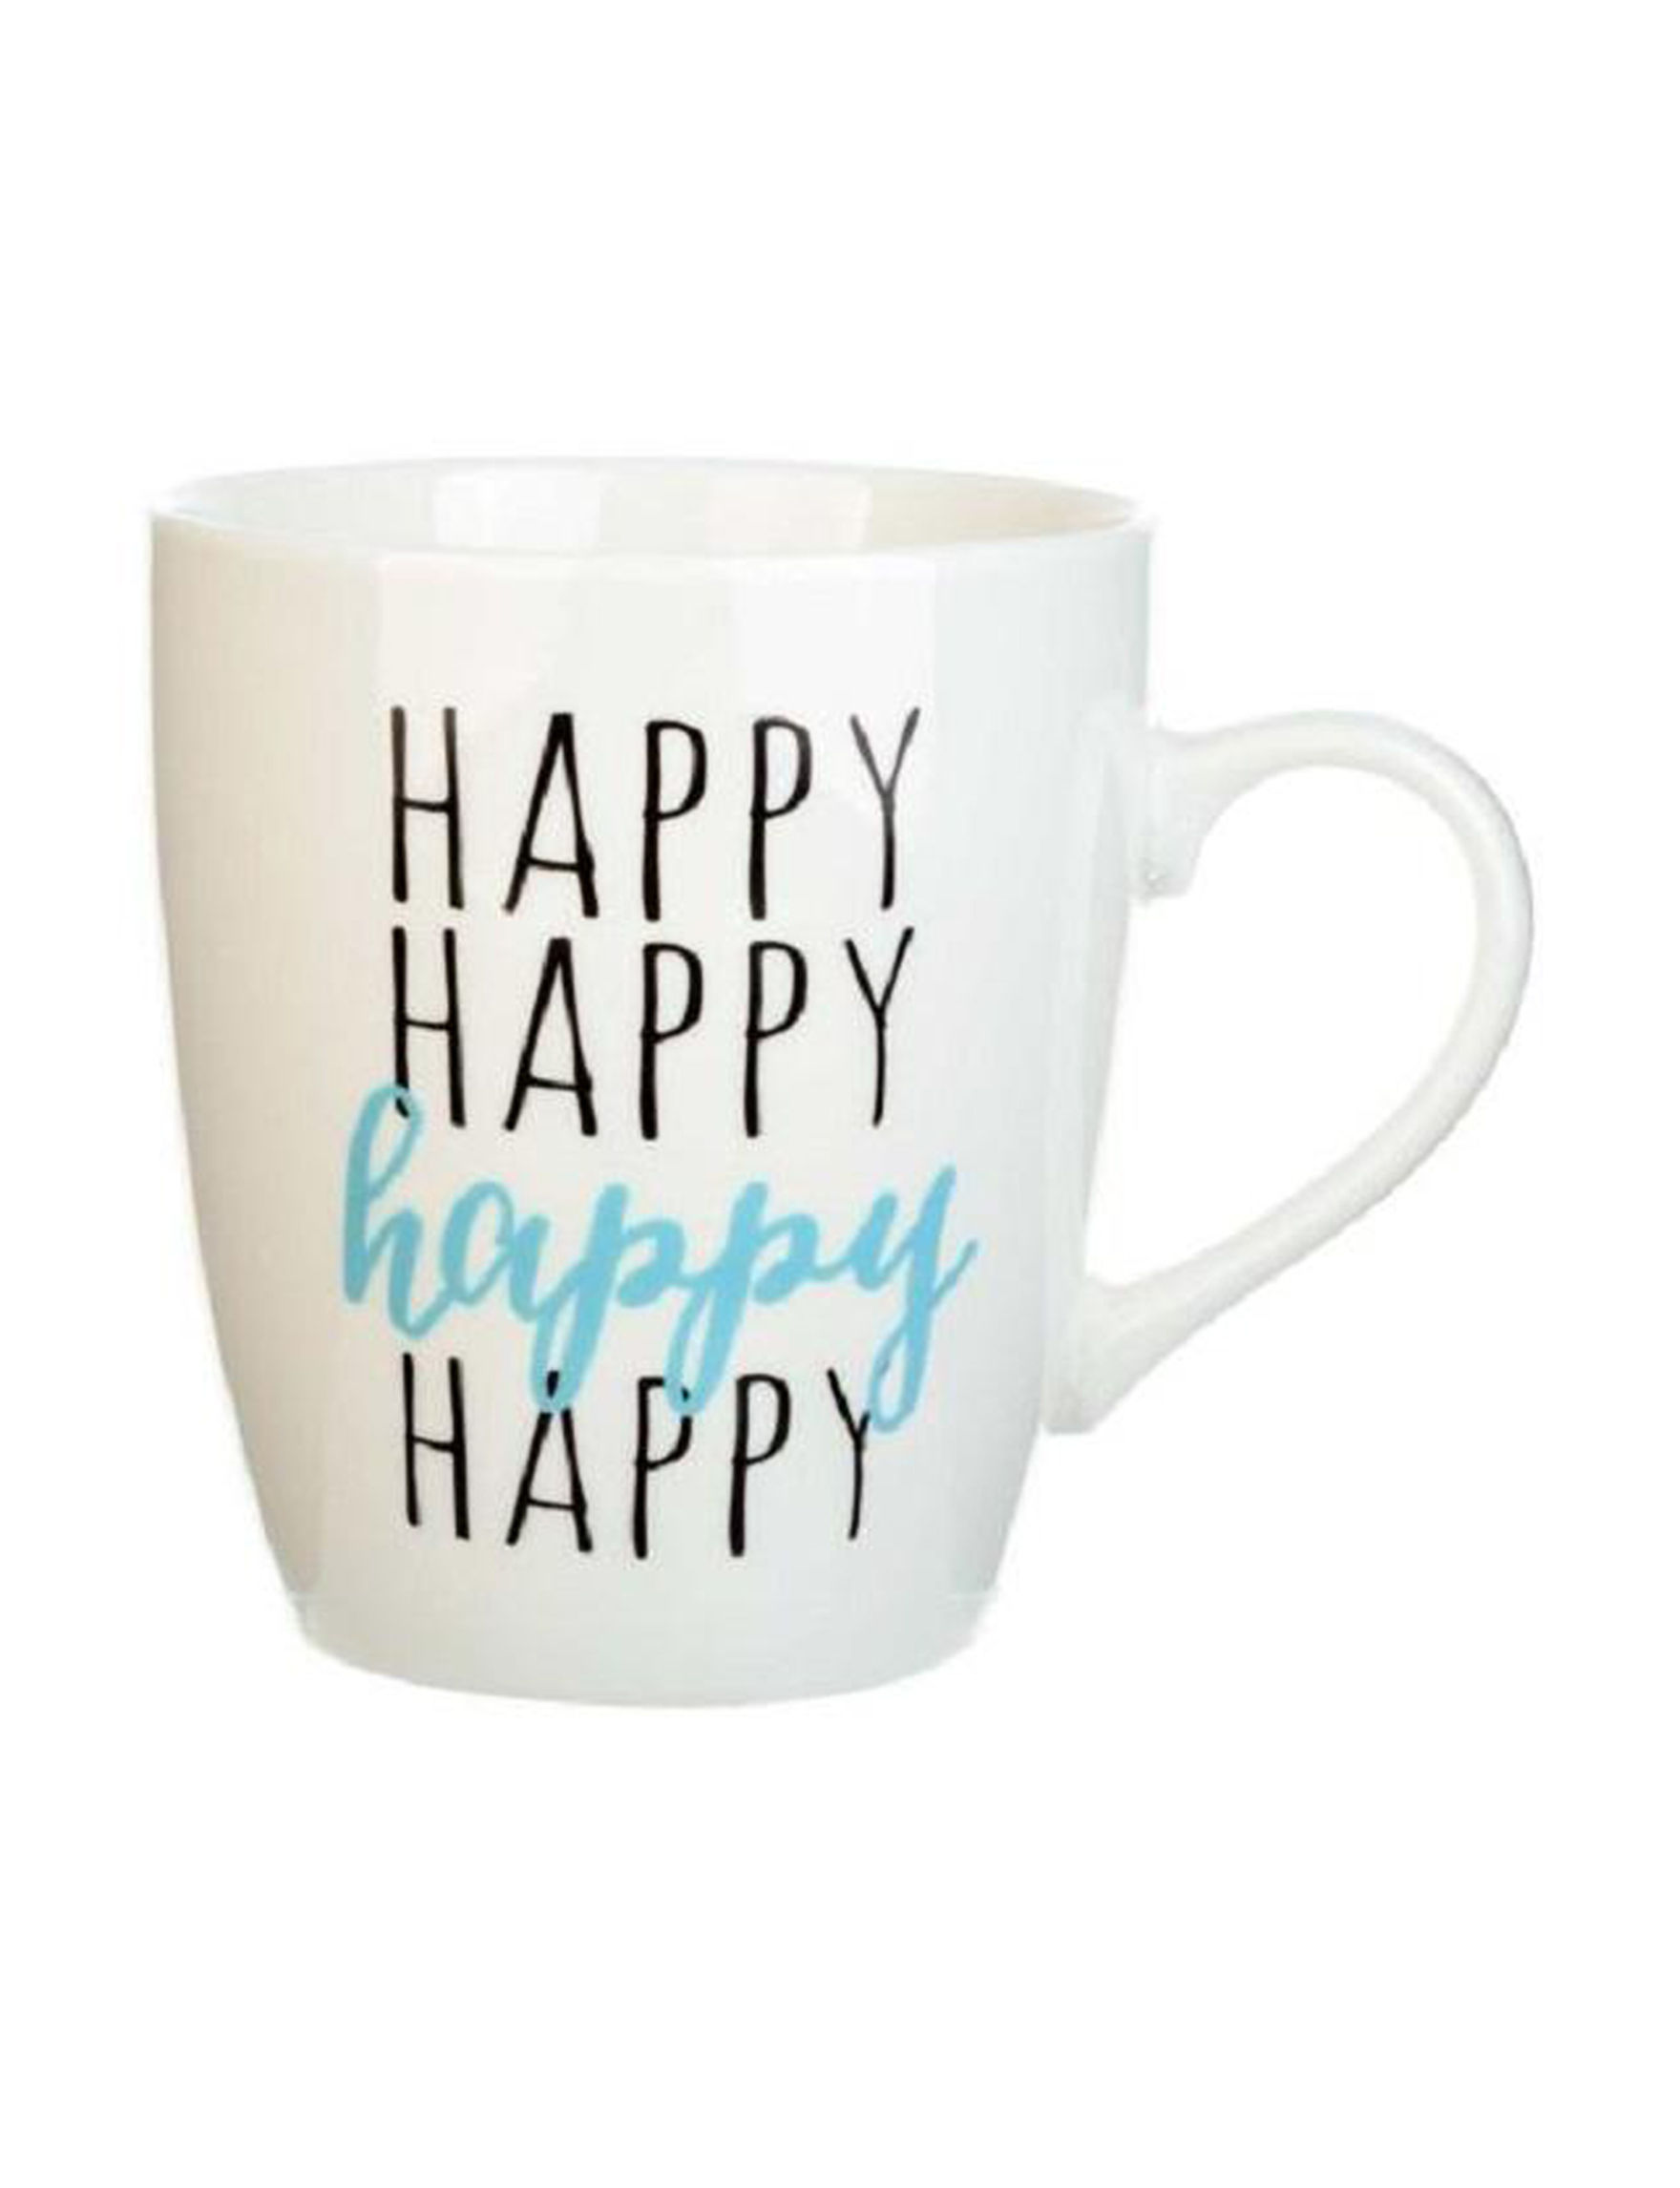 Formation White Mugs Drinkware